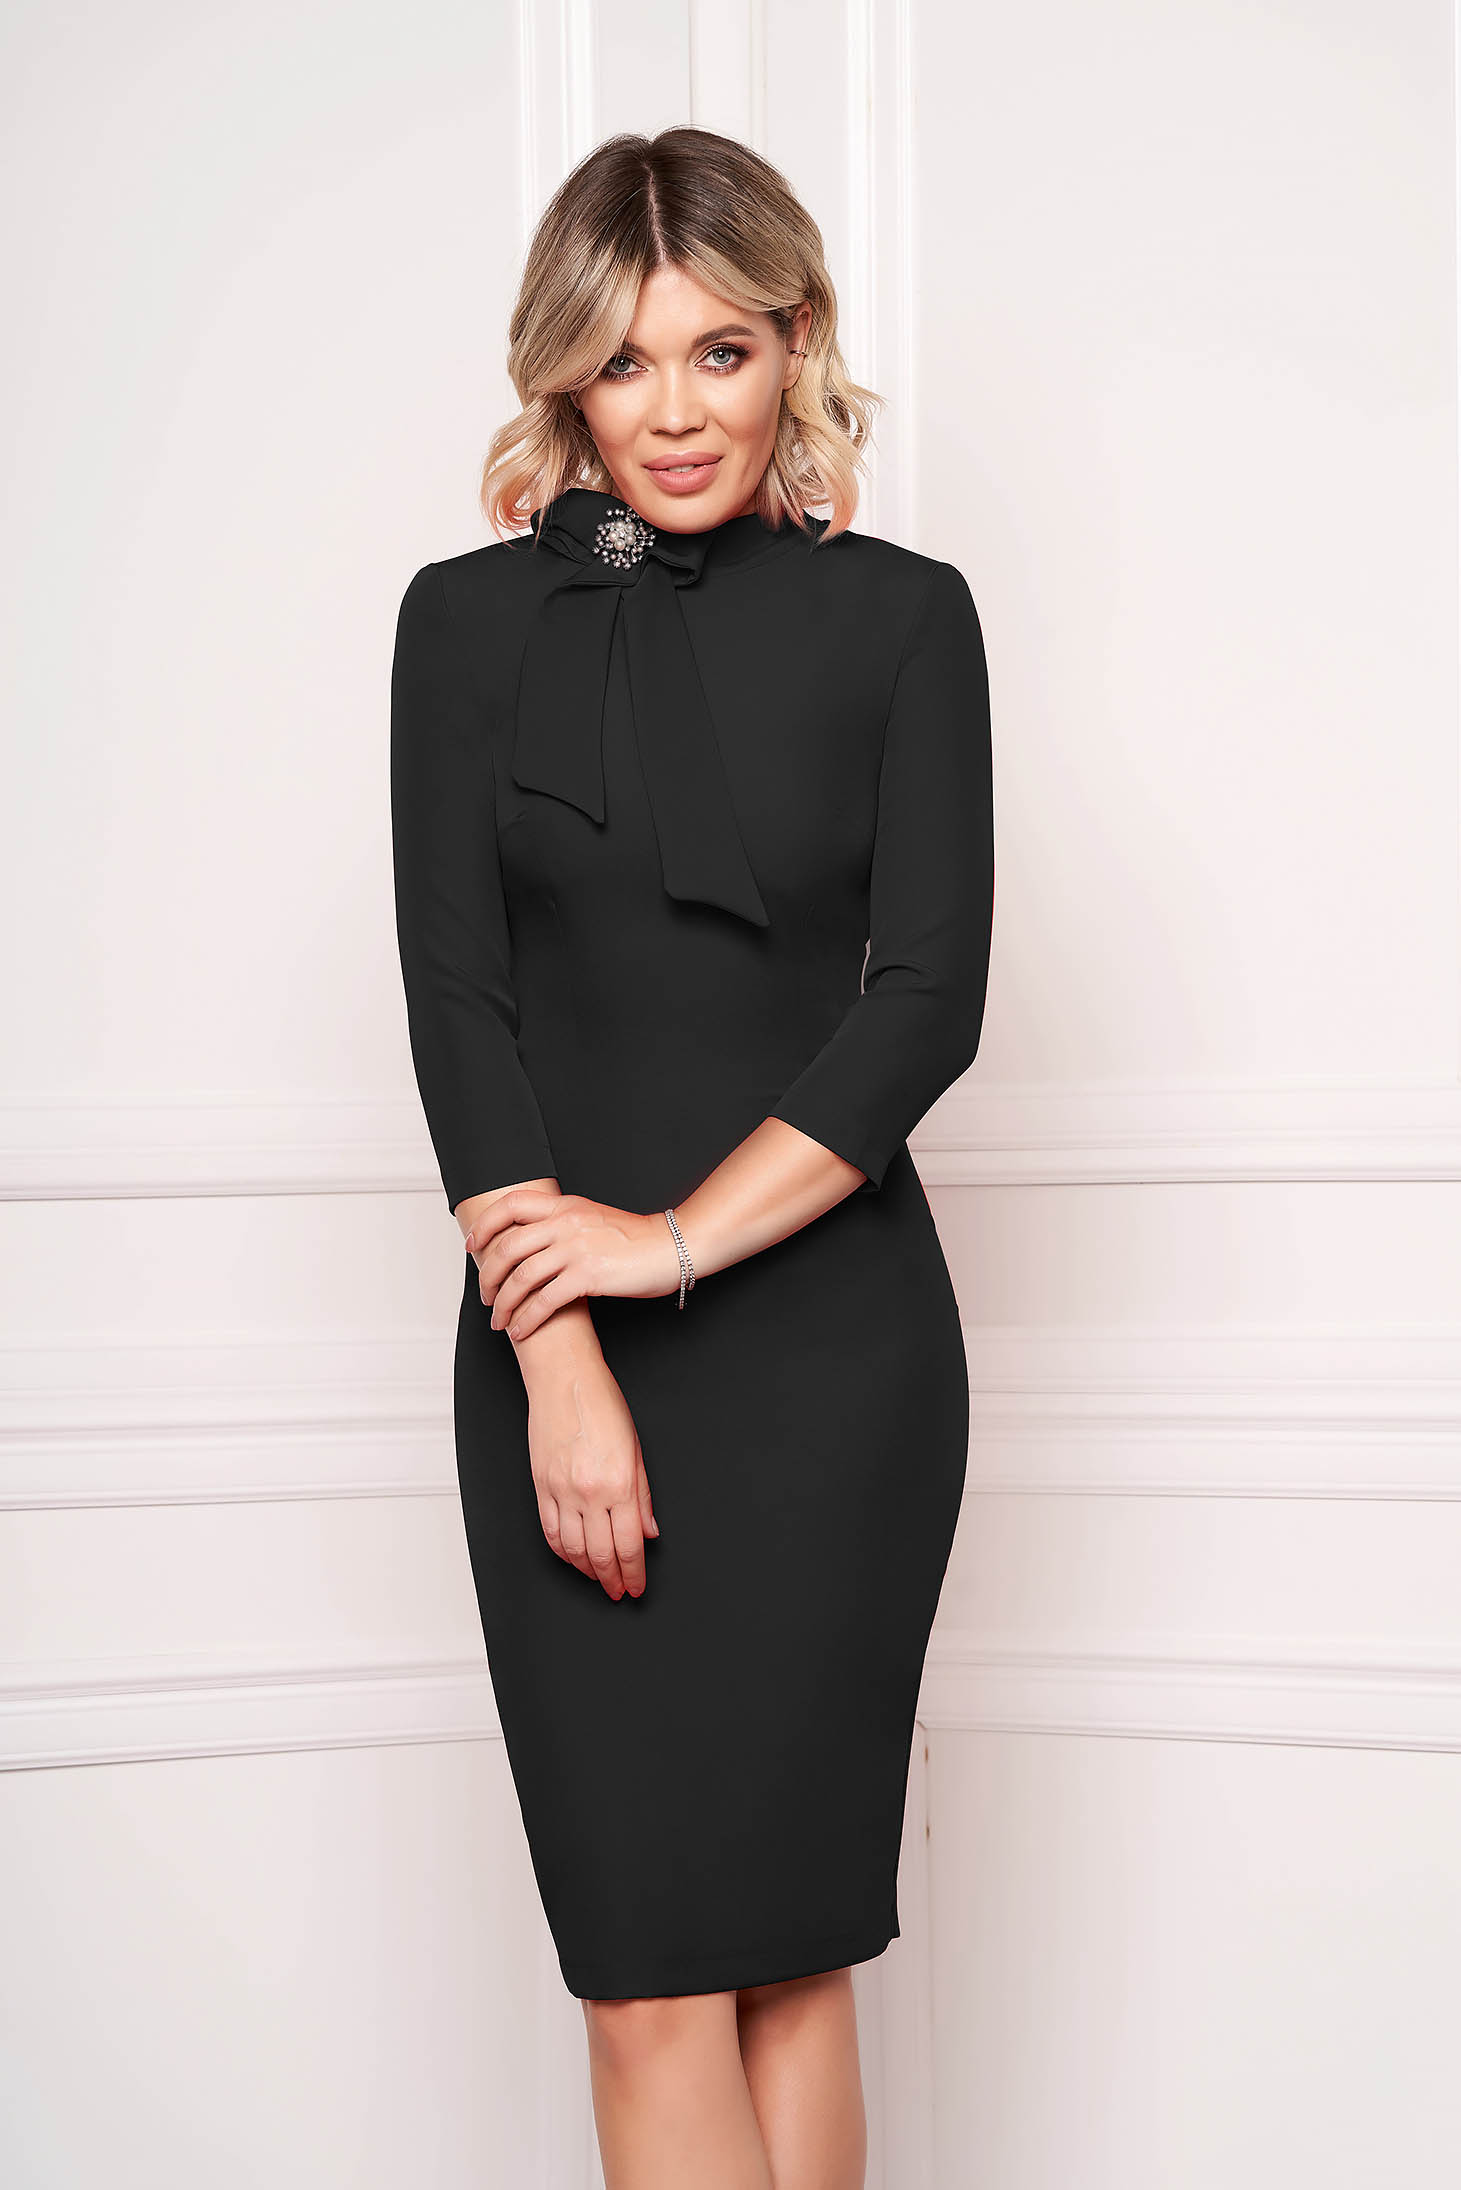 StarShinerS black dress elegant office midi cloth slightly elastic fabric accessorized with breastpin